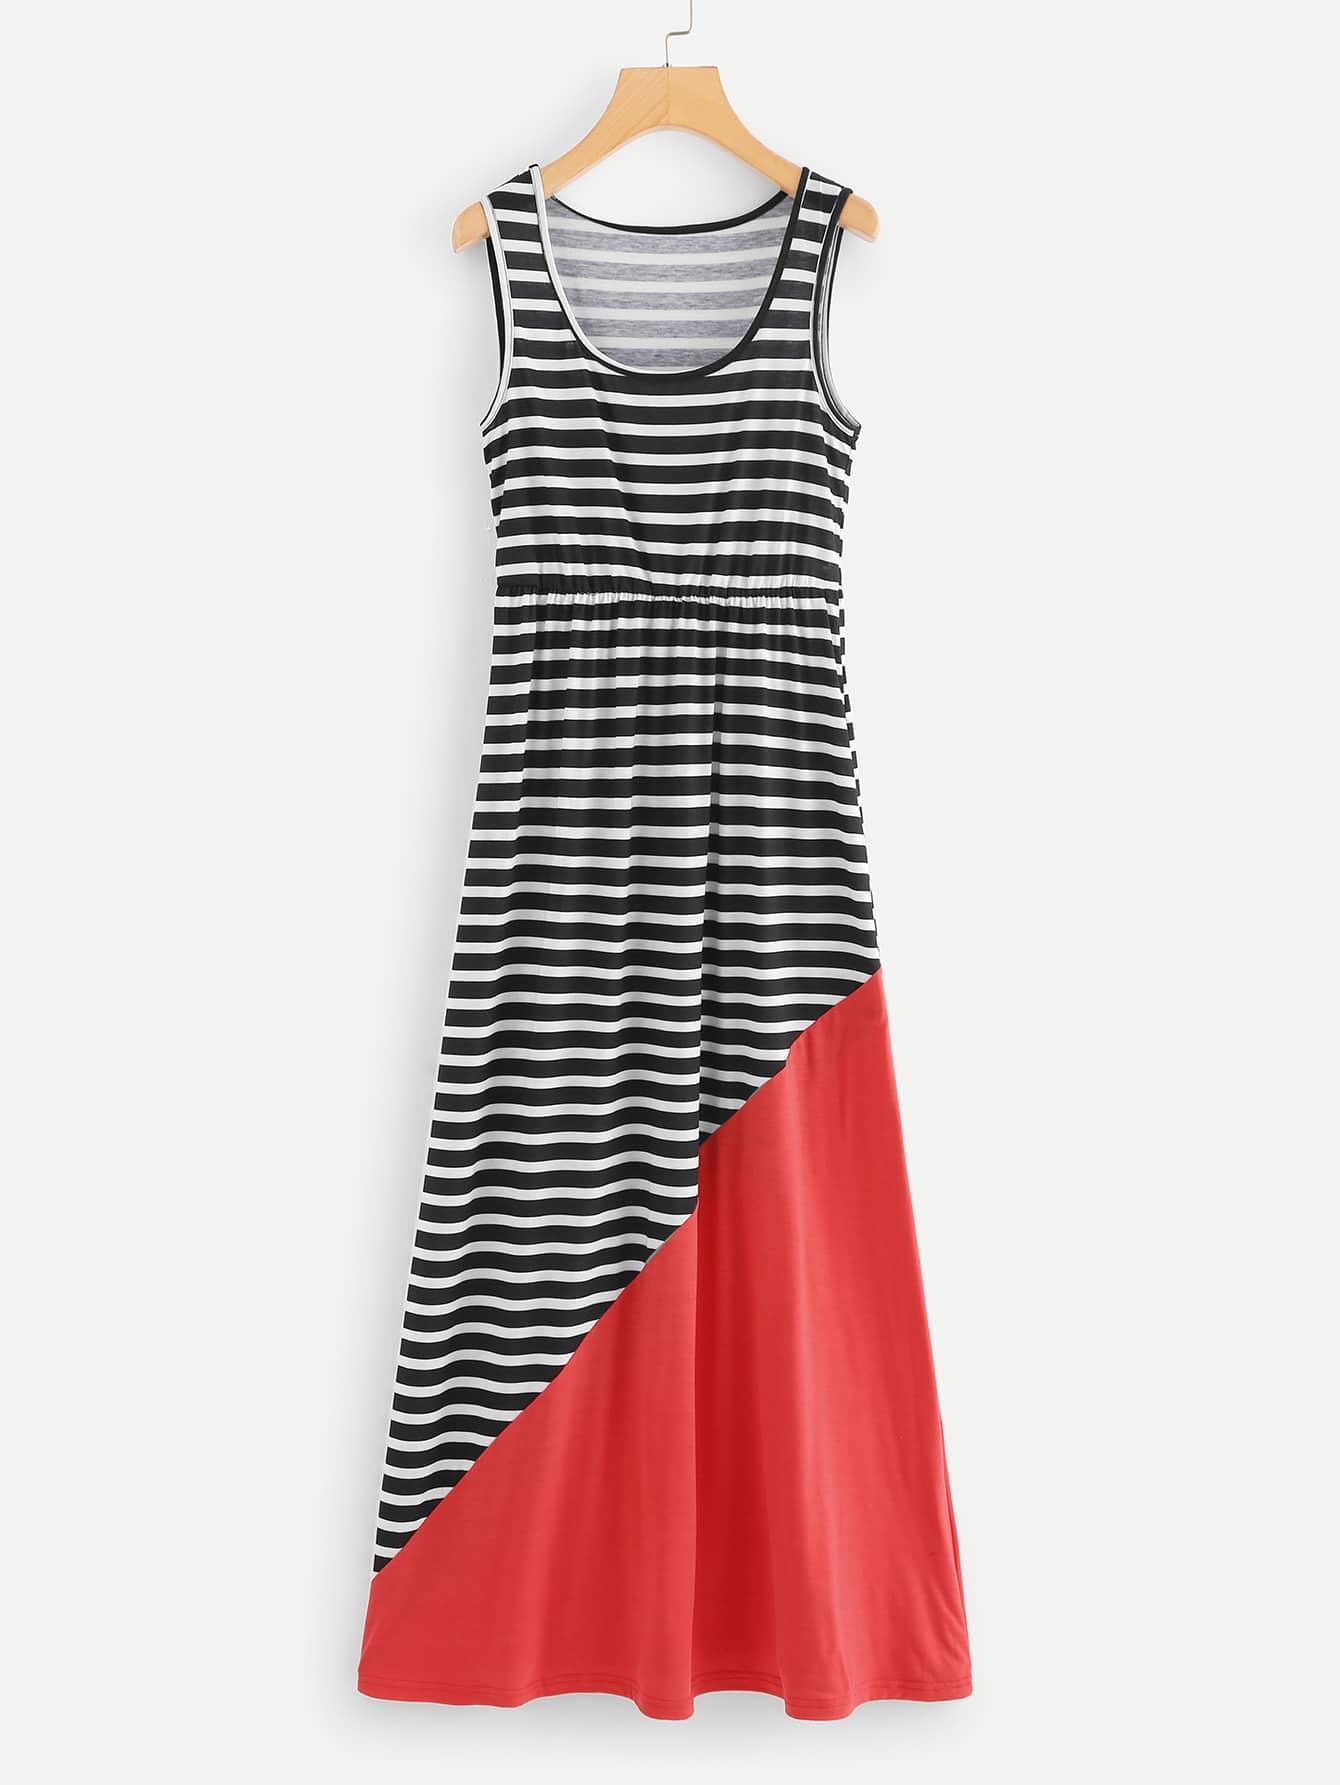 Contrast Panel Striped Dress kids contrast panel sleeveless dress